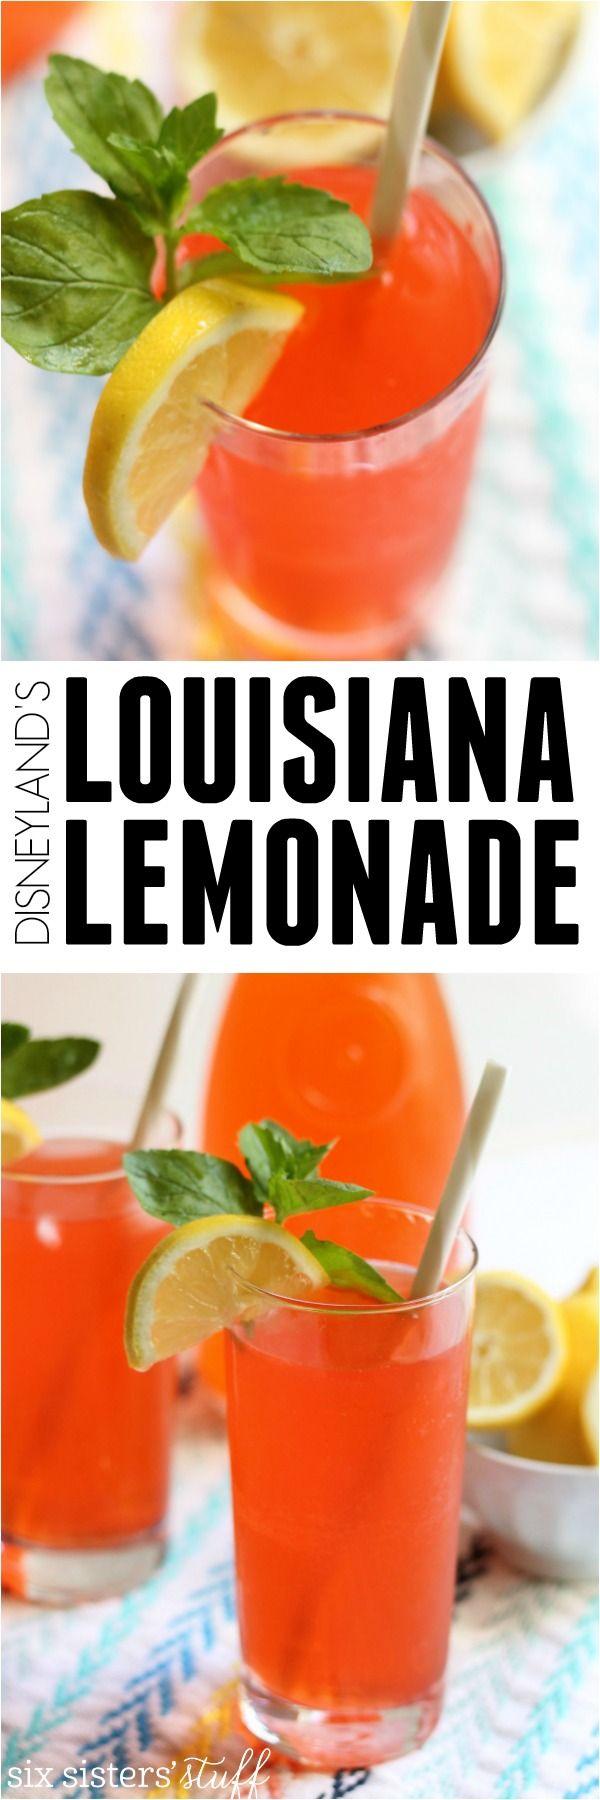 Louisiana Lemonade Copycat on Six Sisters' Stuff